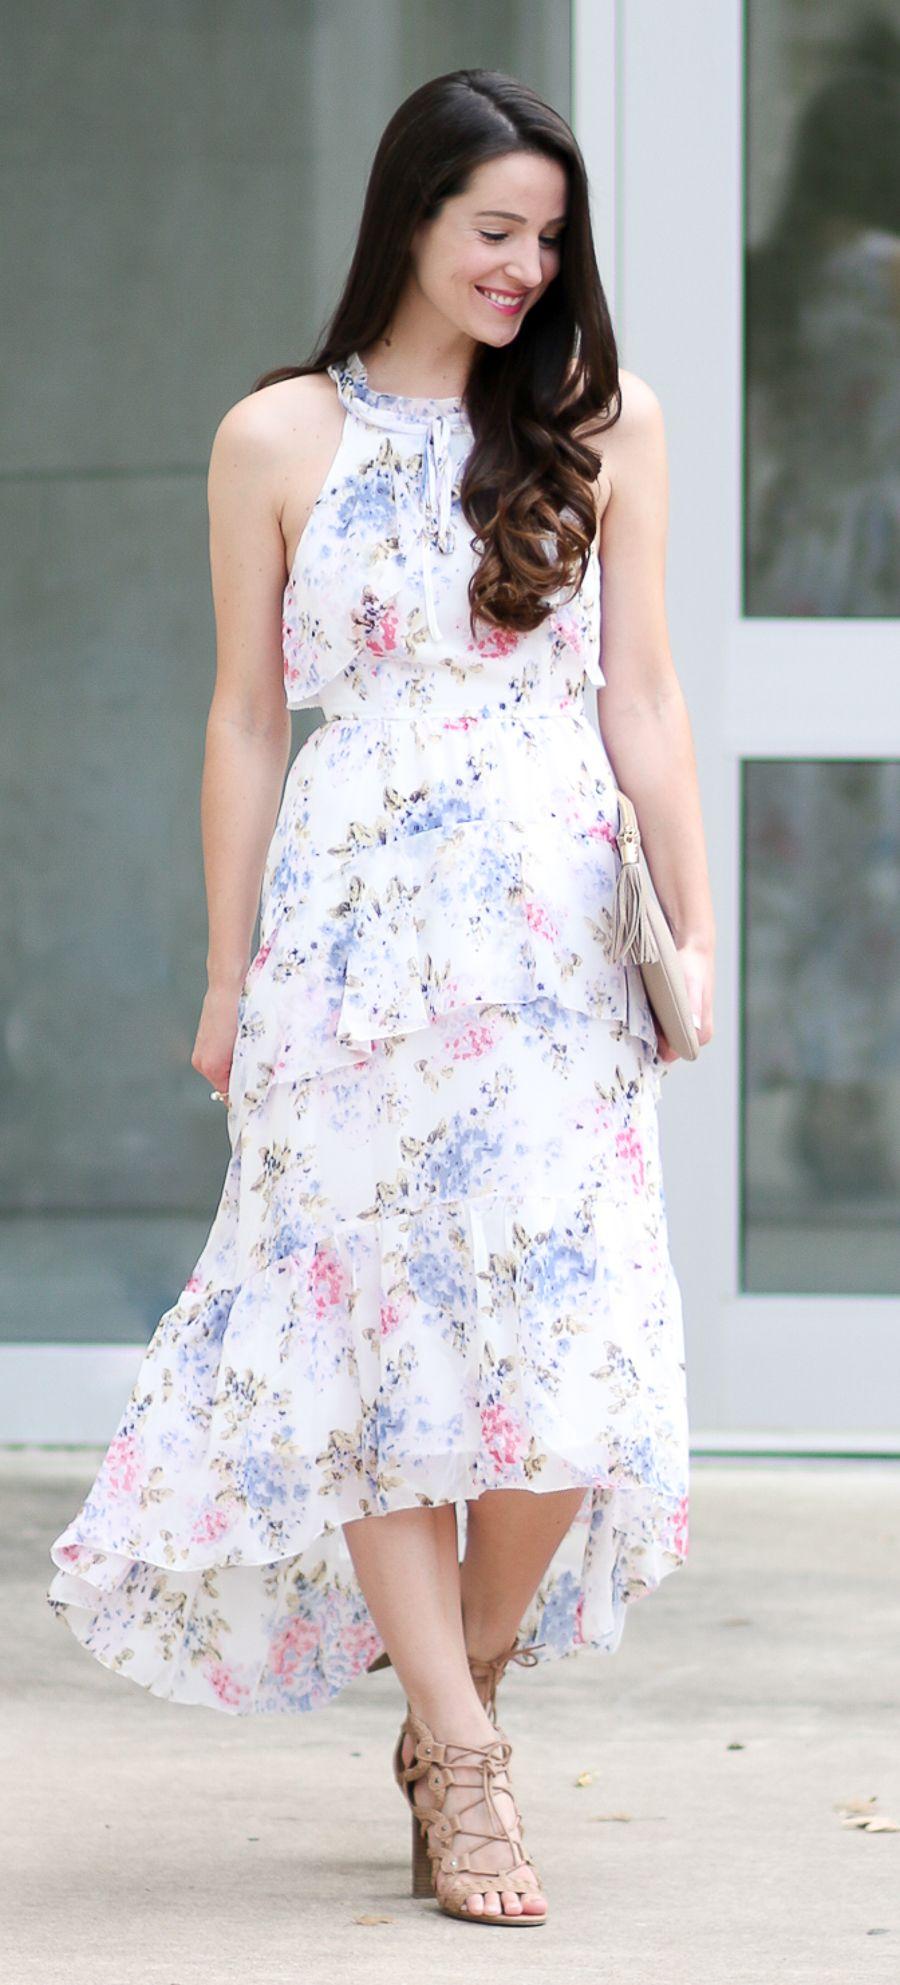 Wearing White To A Wedding After Market Floral Chiffon Maxi Dress Floral Chiffon Maxi Dress Dresses Chiffon Maxi Dress [ 1985 x 900 Pixel ]